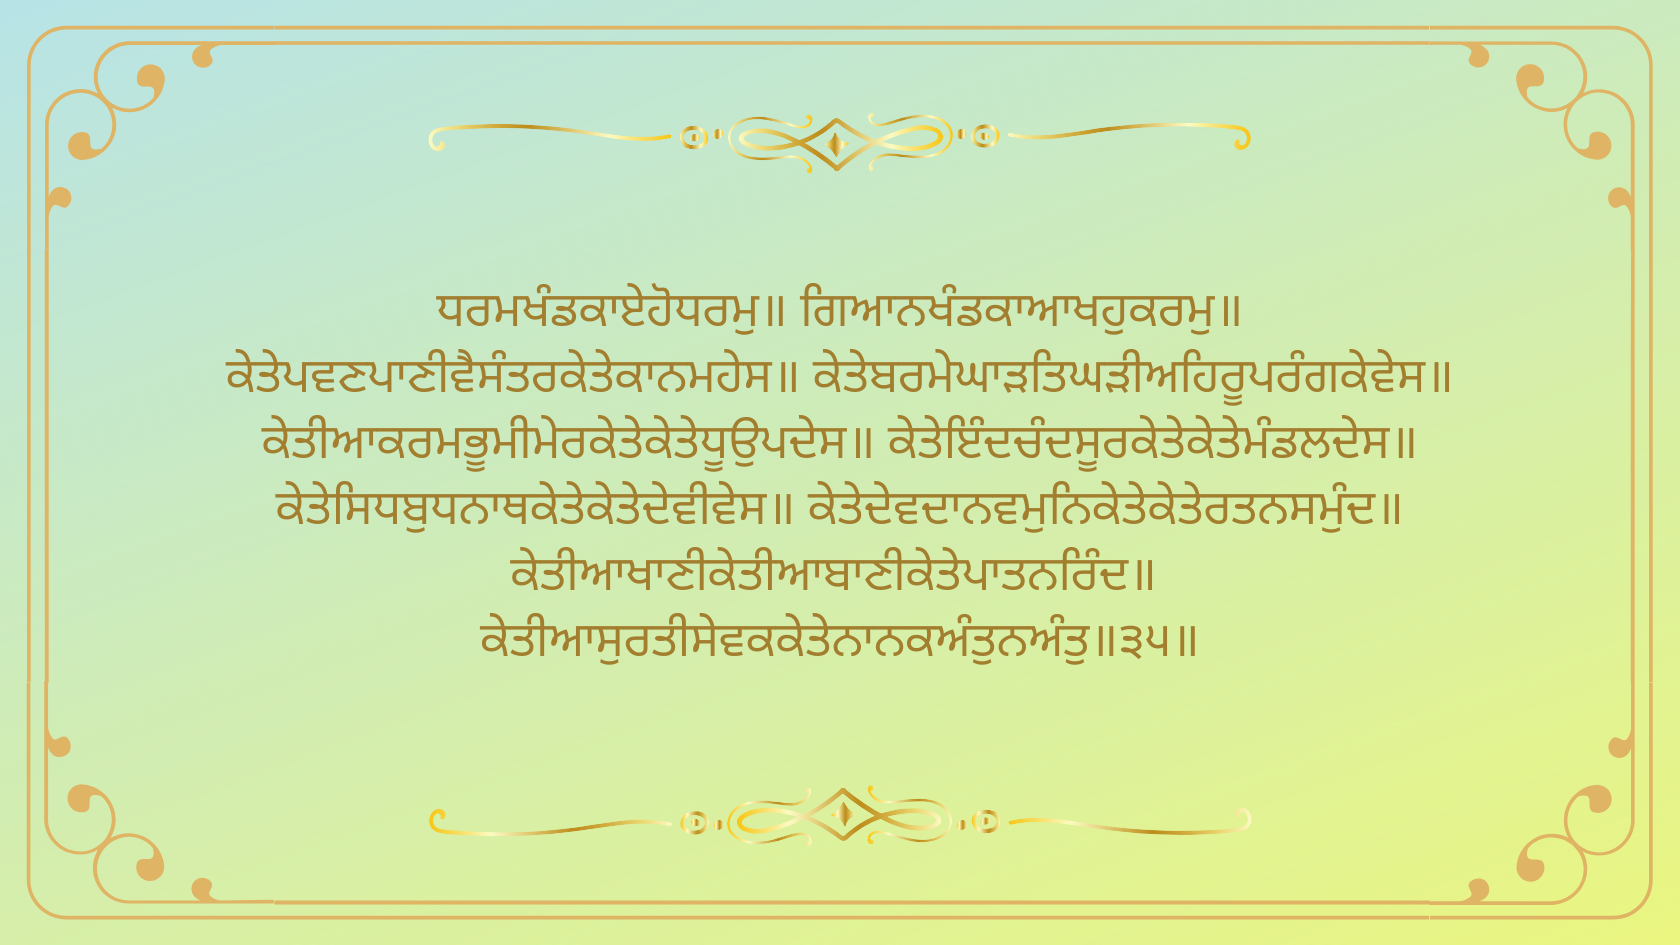 Dharam Khand Kaa Ayho Dharam